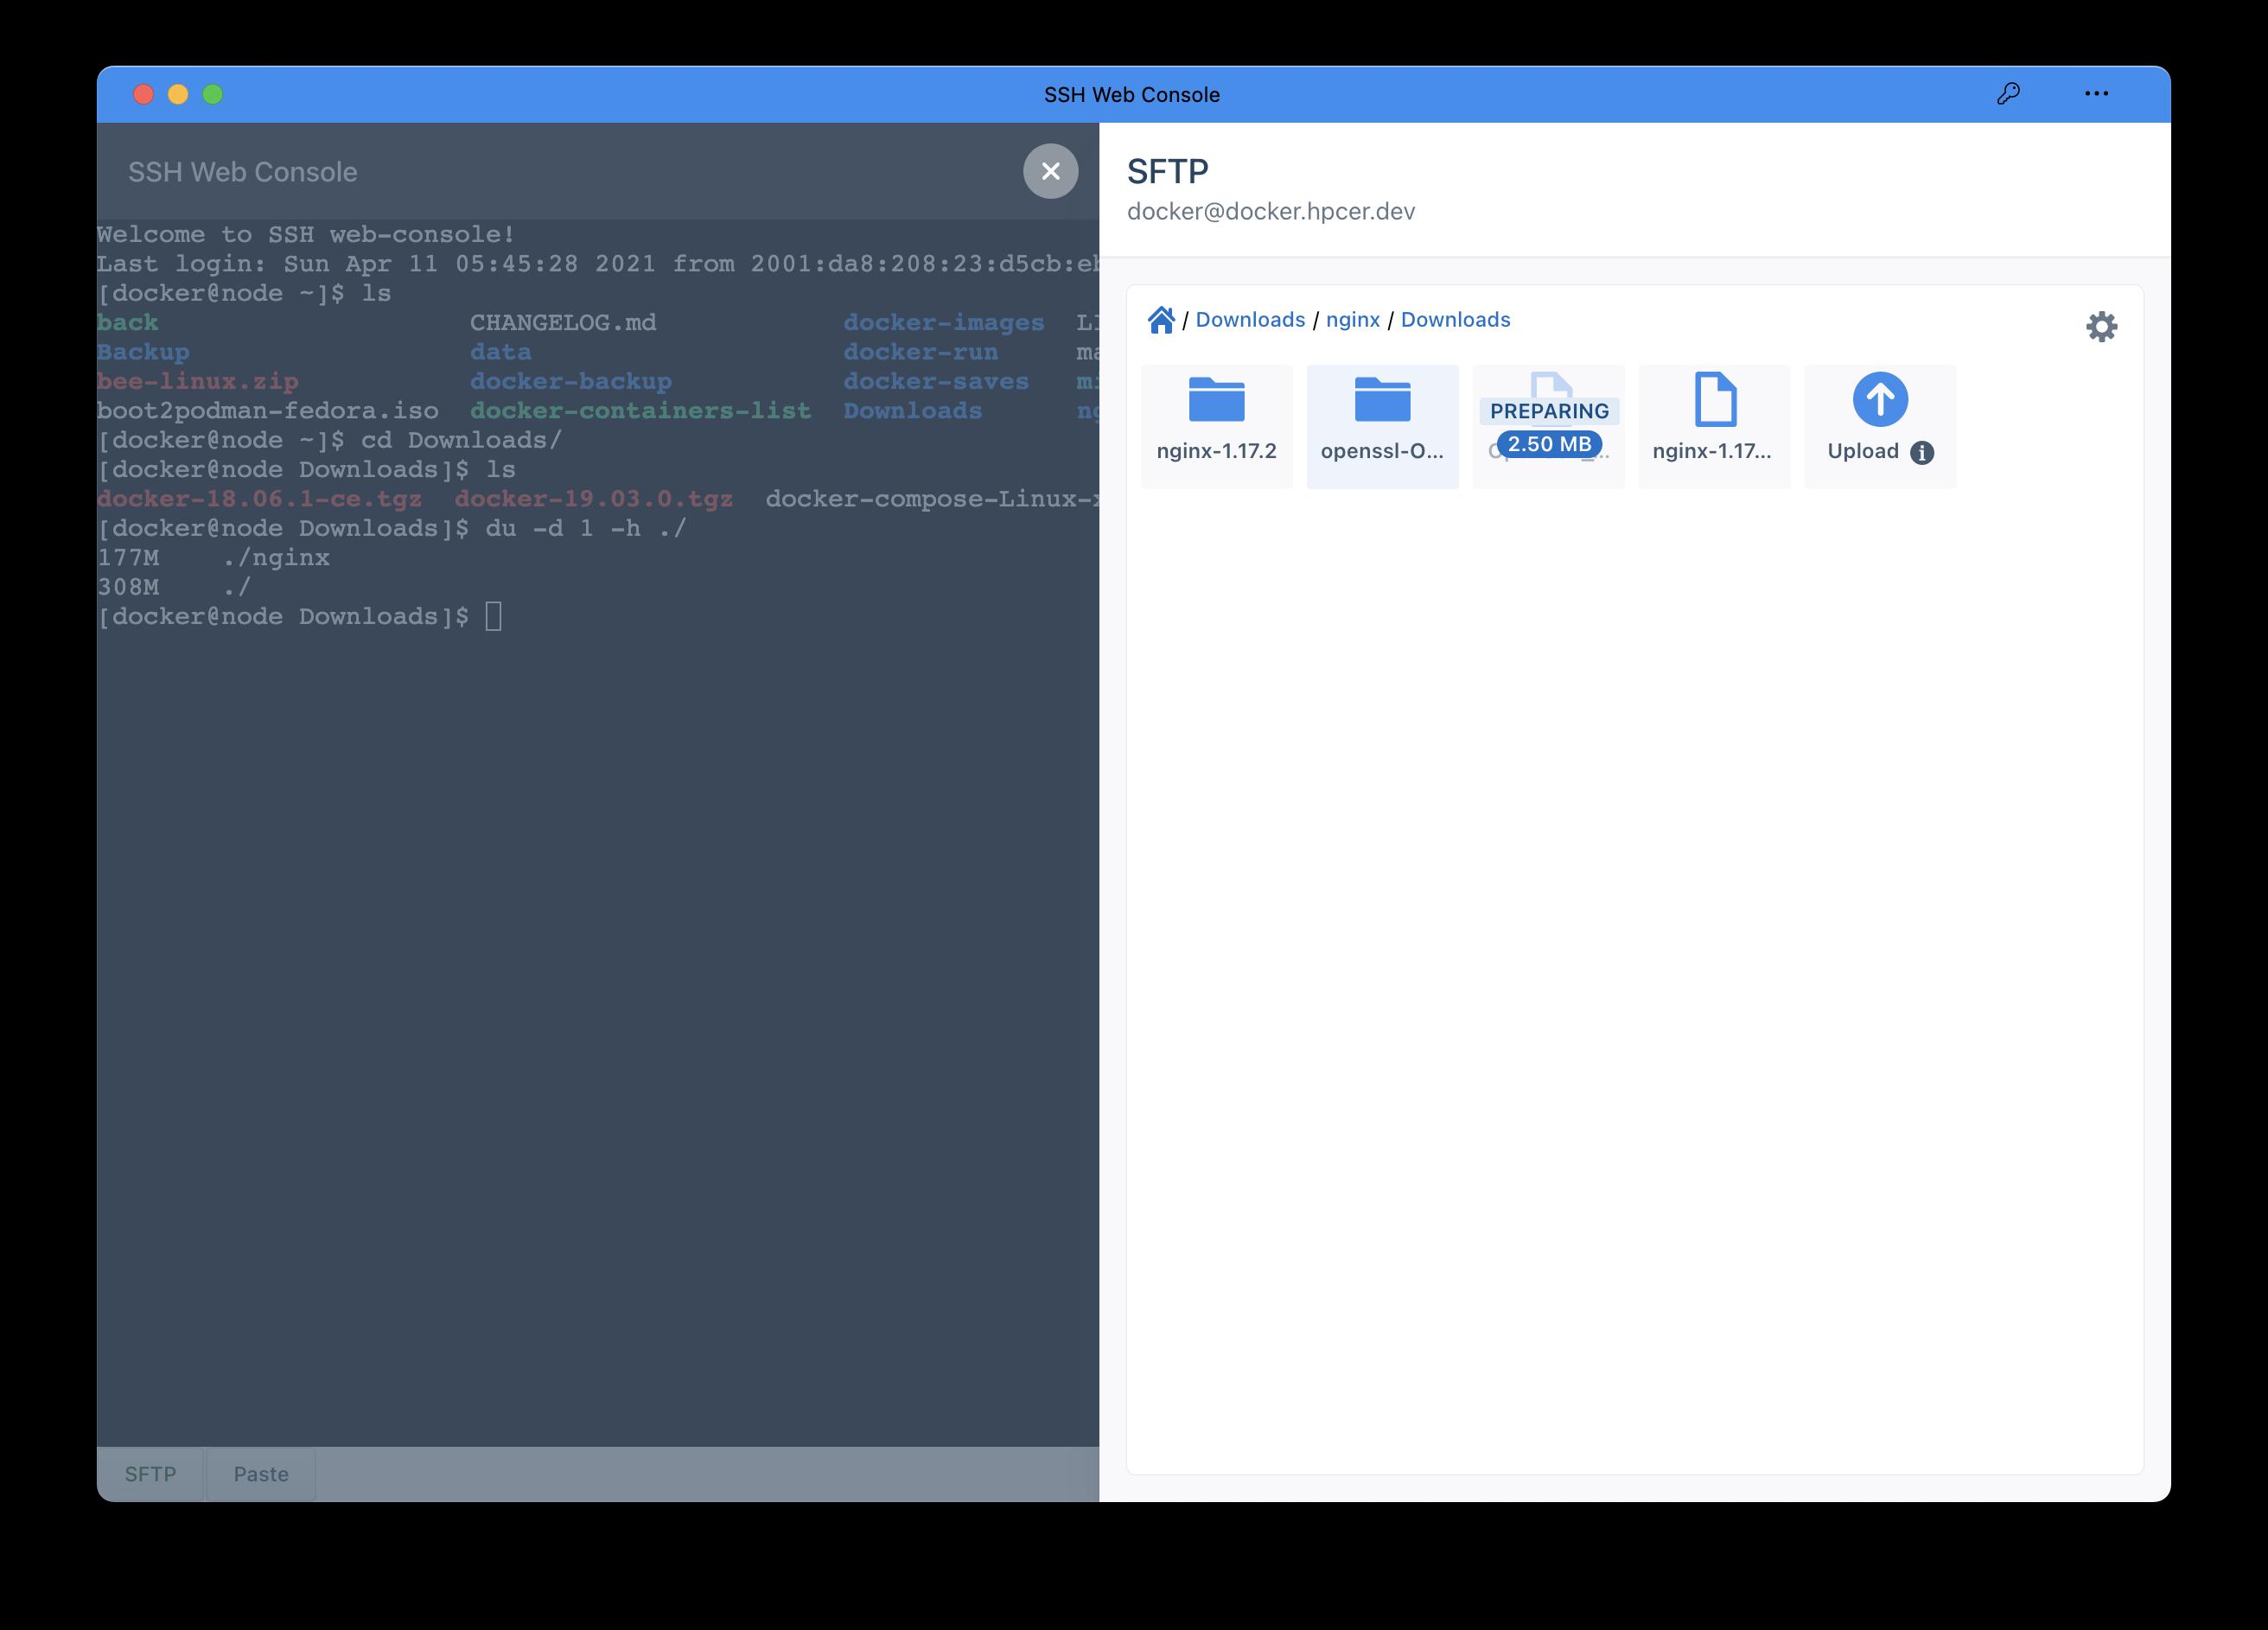 ssh-web-console一款基于go语言开发的web端ssh工具